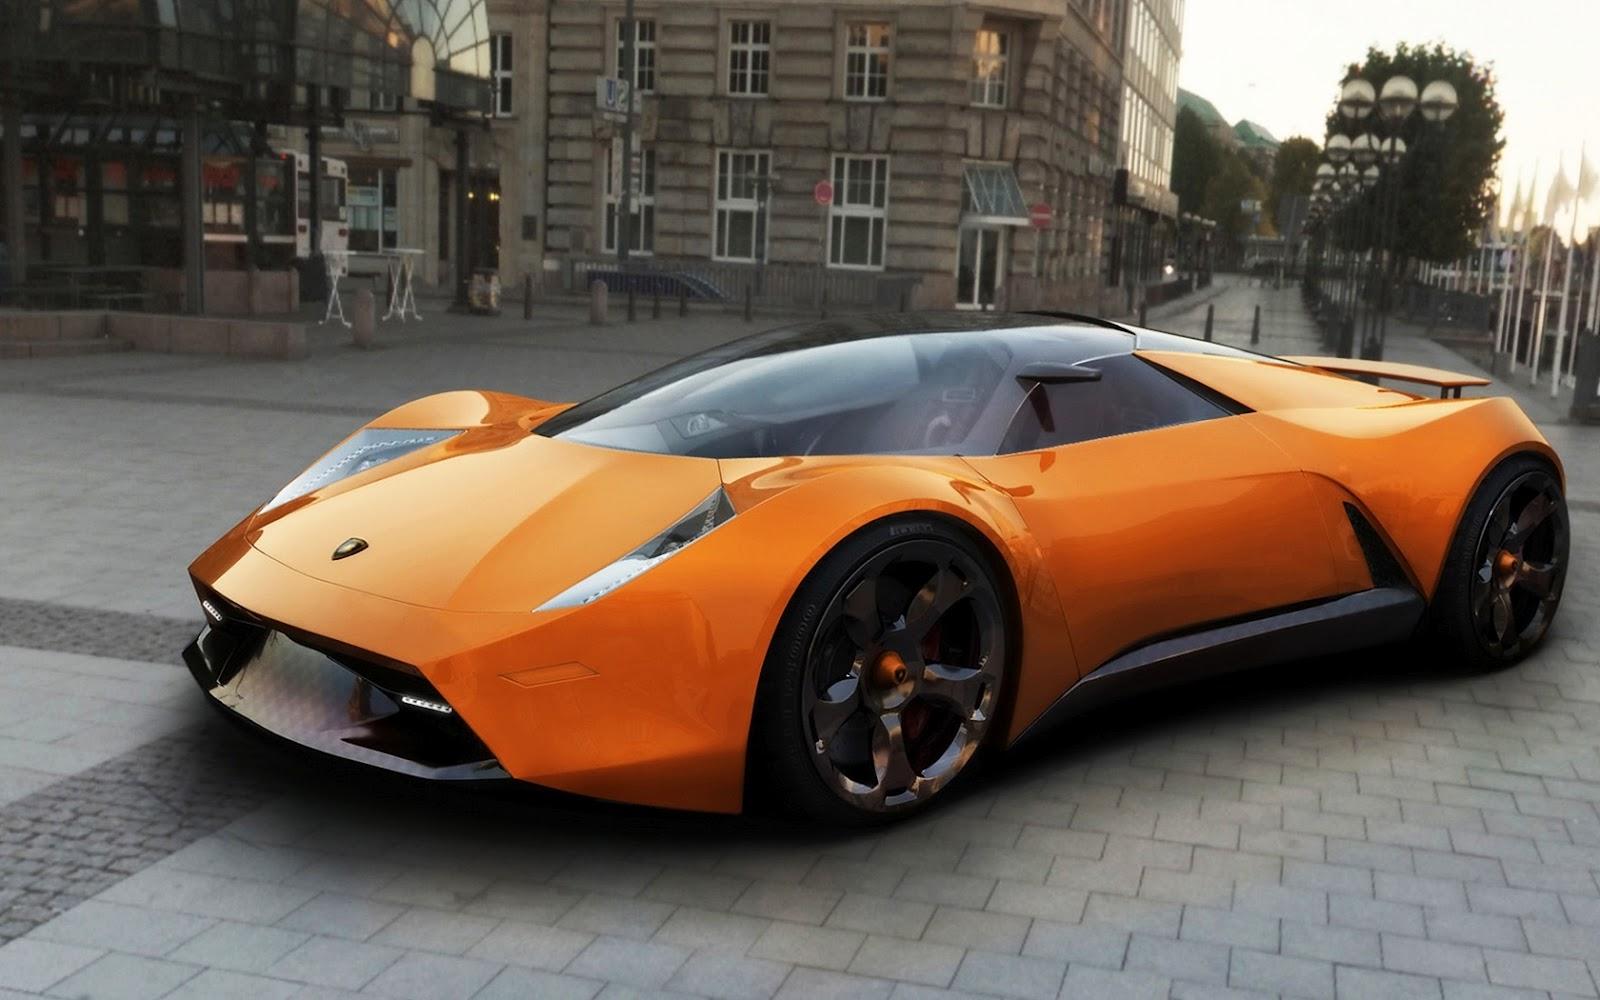 Lamborghini Insecta Concept Car Cars Wallpapers